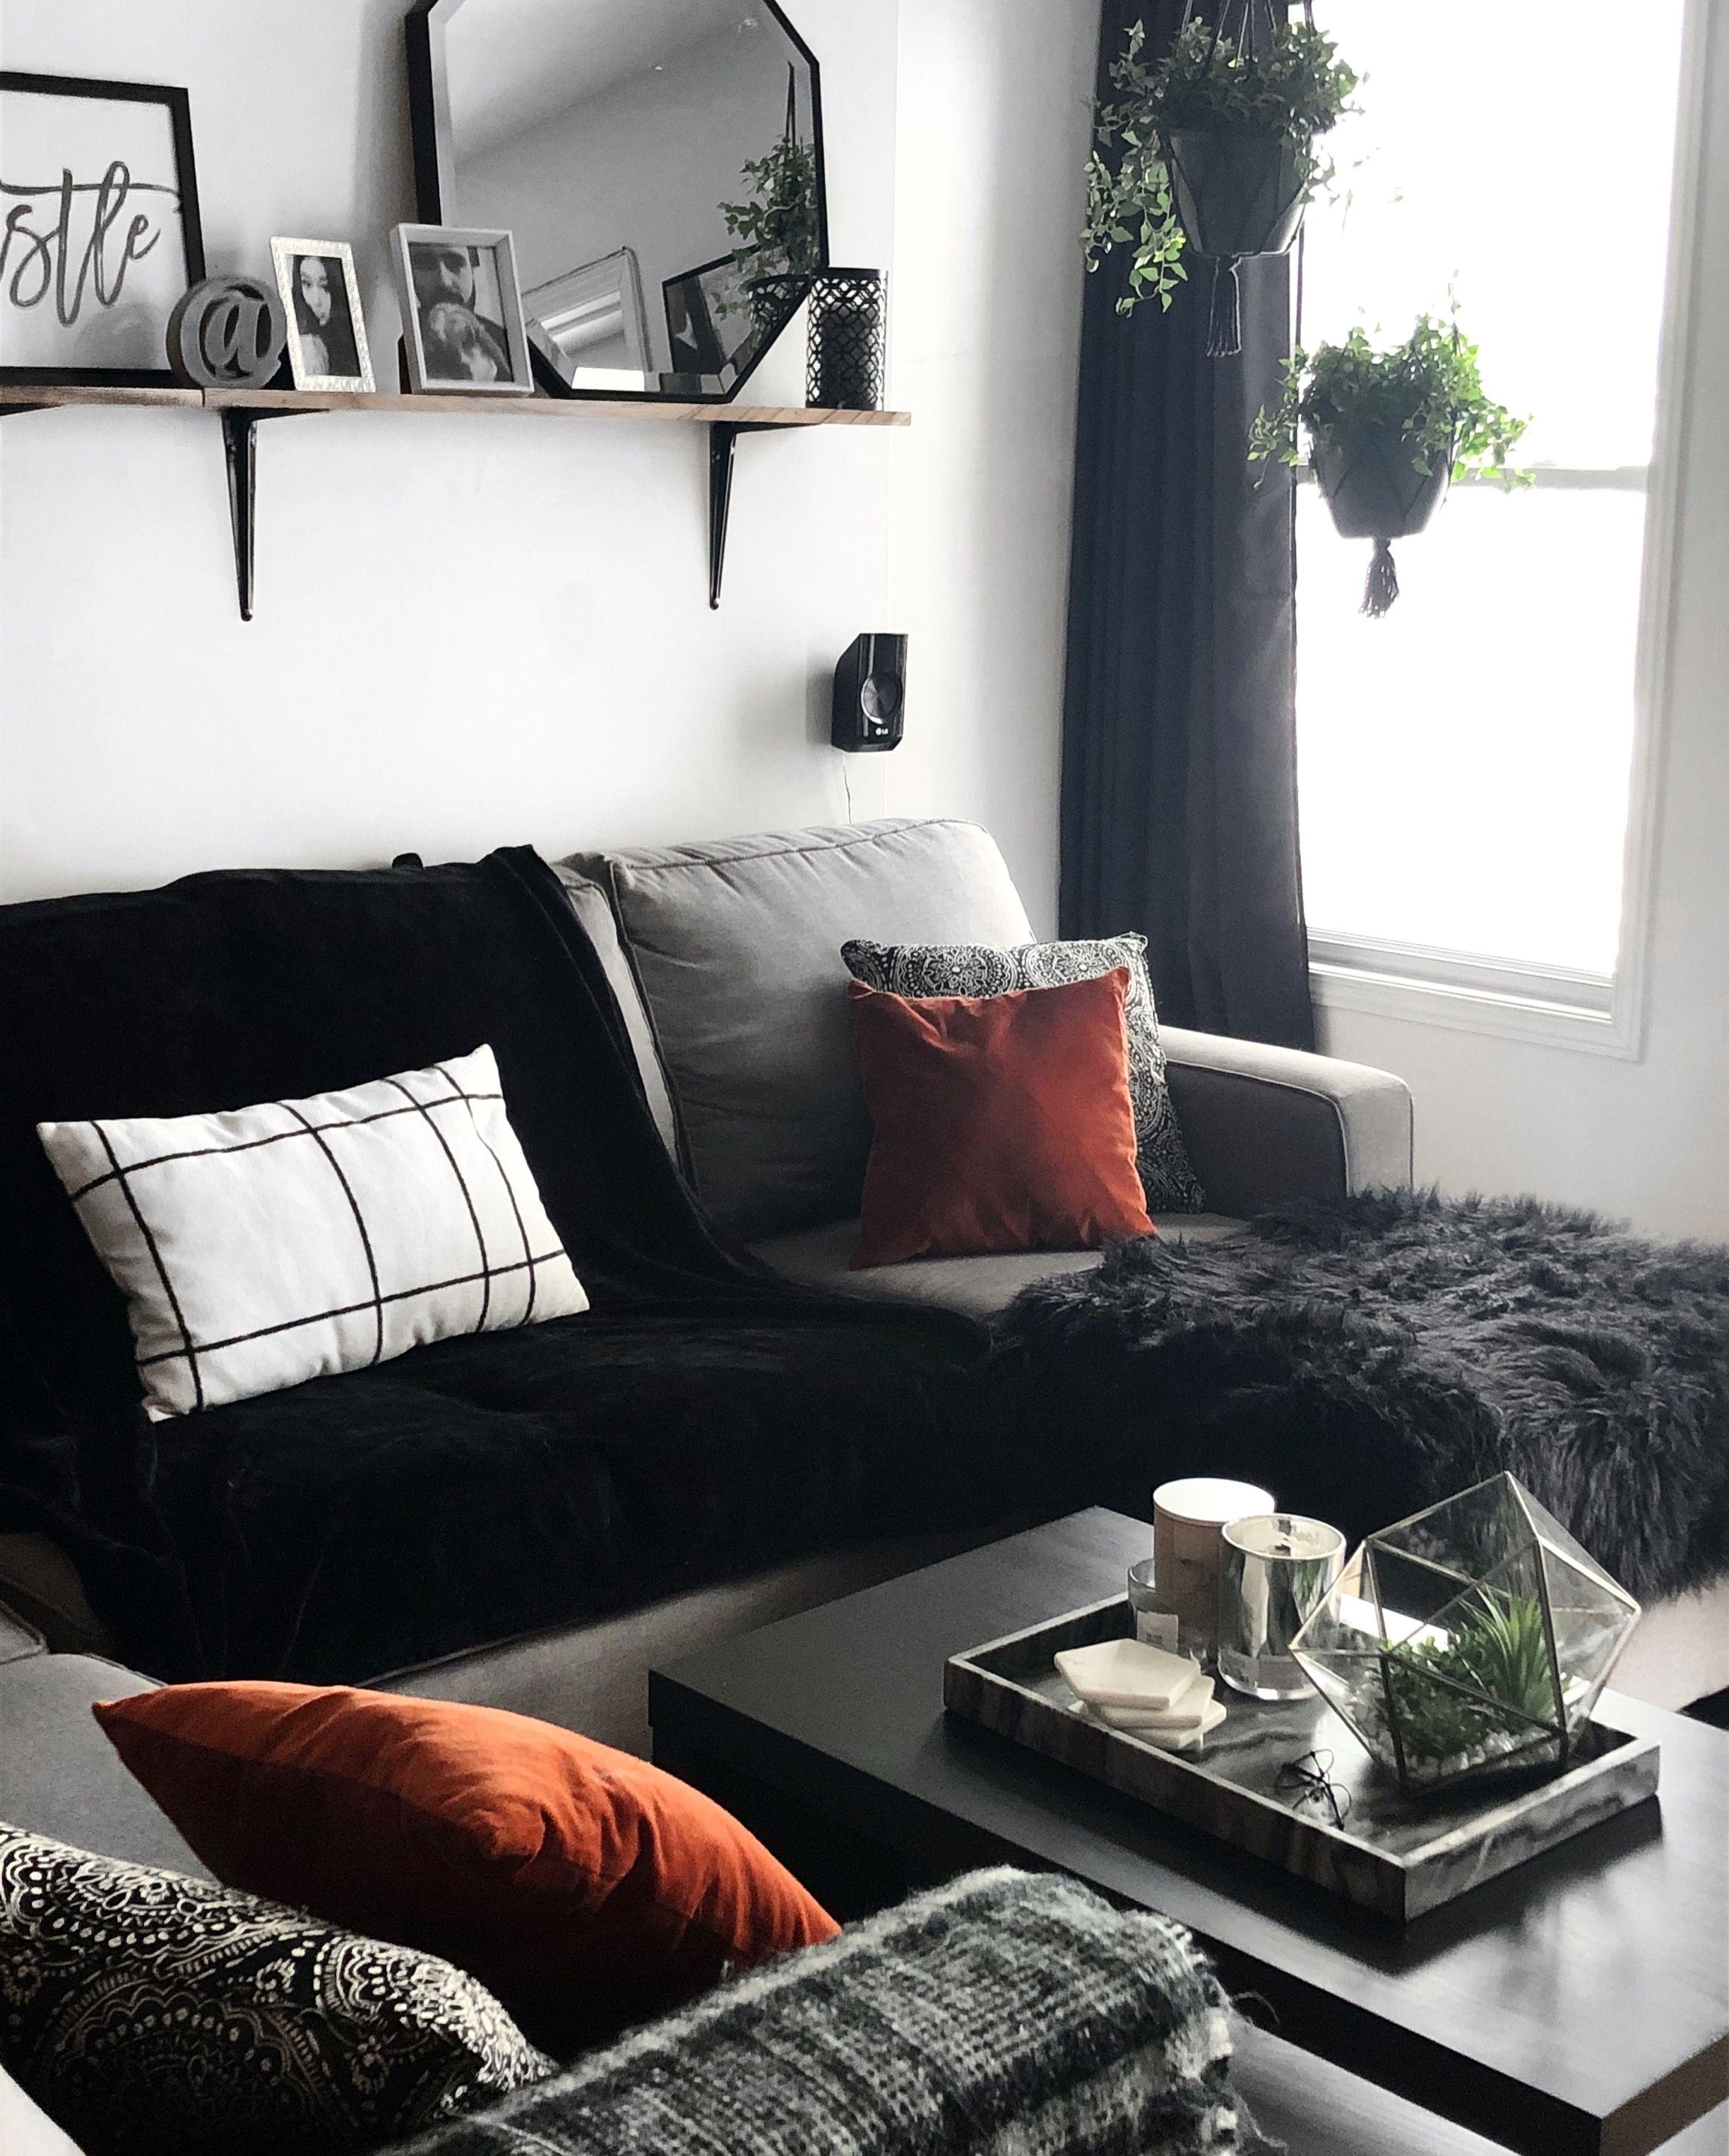 Boho Meet Modern On A Budjet Living Room Macramé Easy Student Dream Apartment Cribs